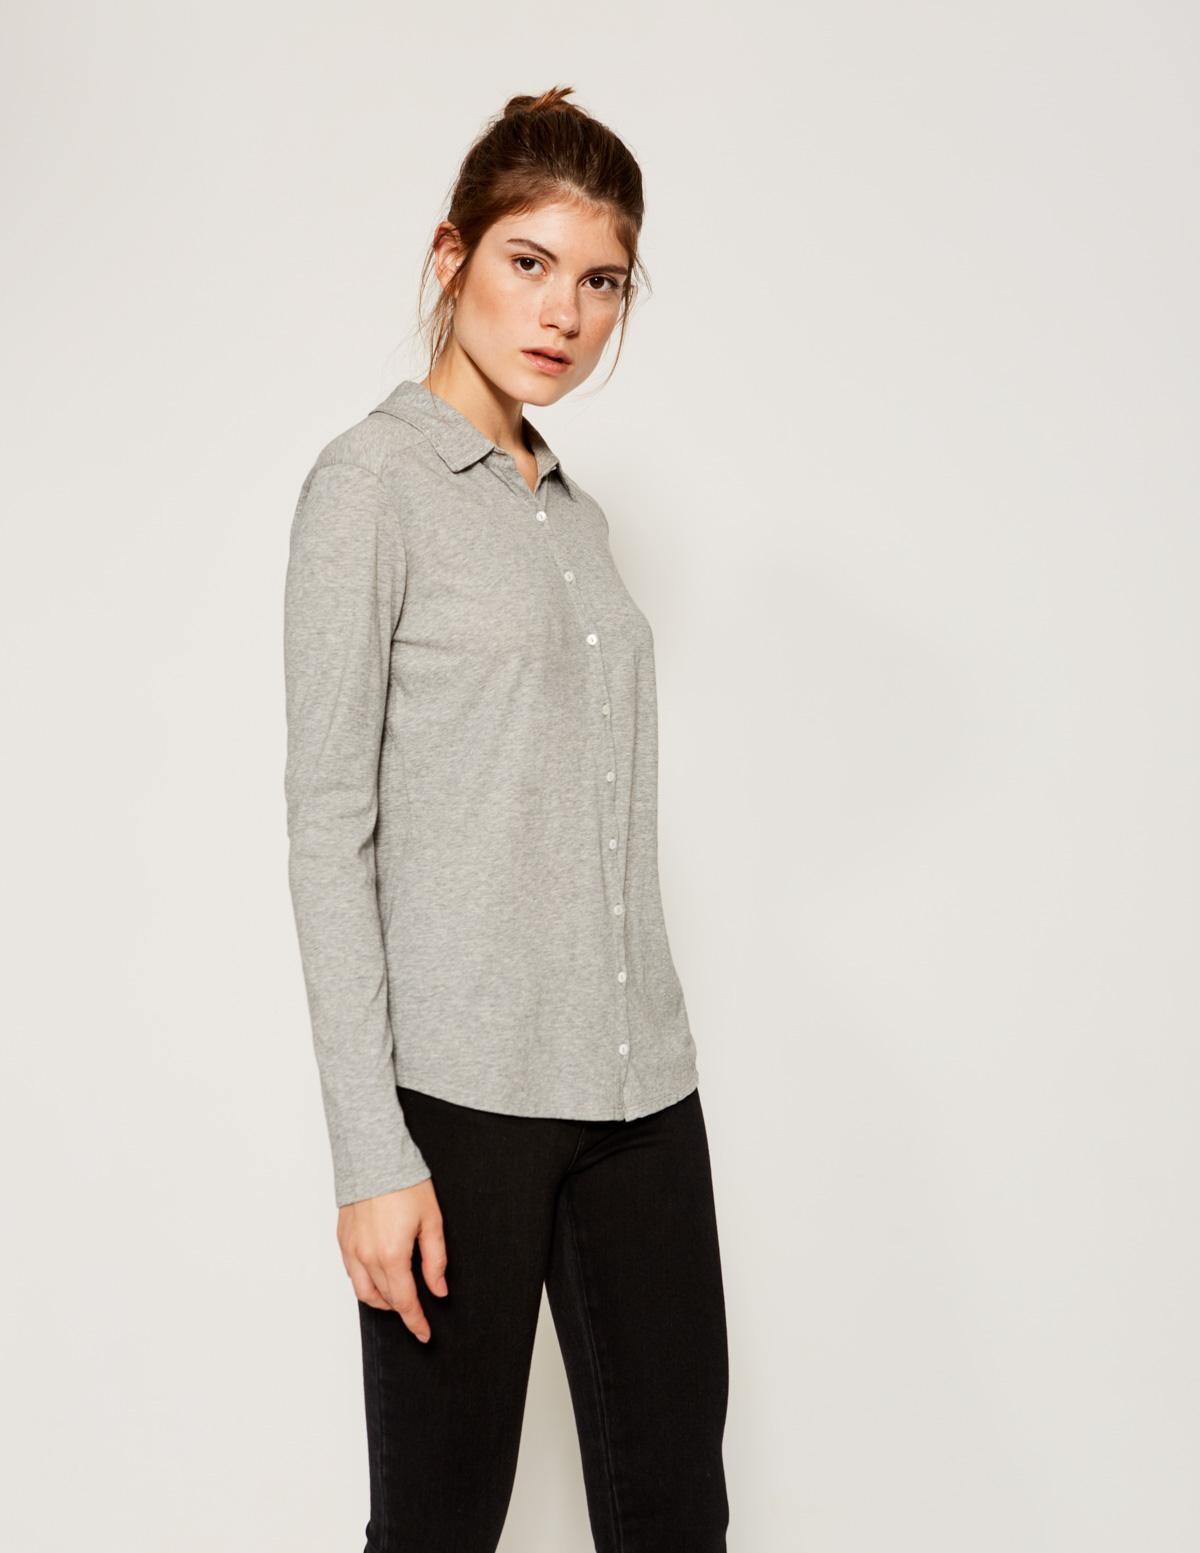 Camisa algodón orgánico - Ítem1